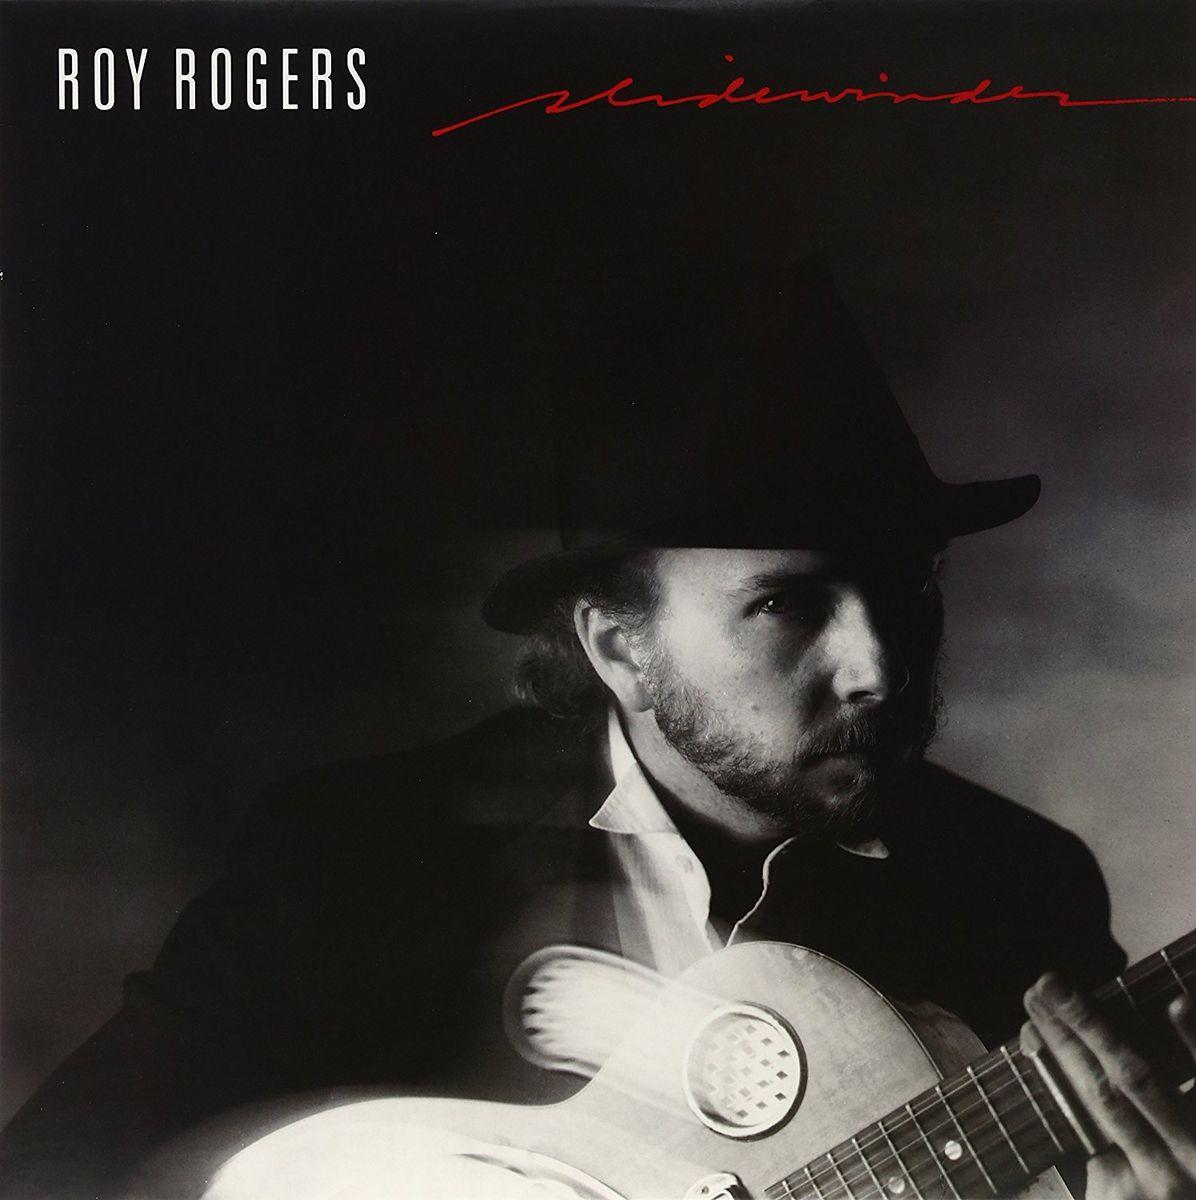 Roy-Rogers-Slidewinder-LP-152069494